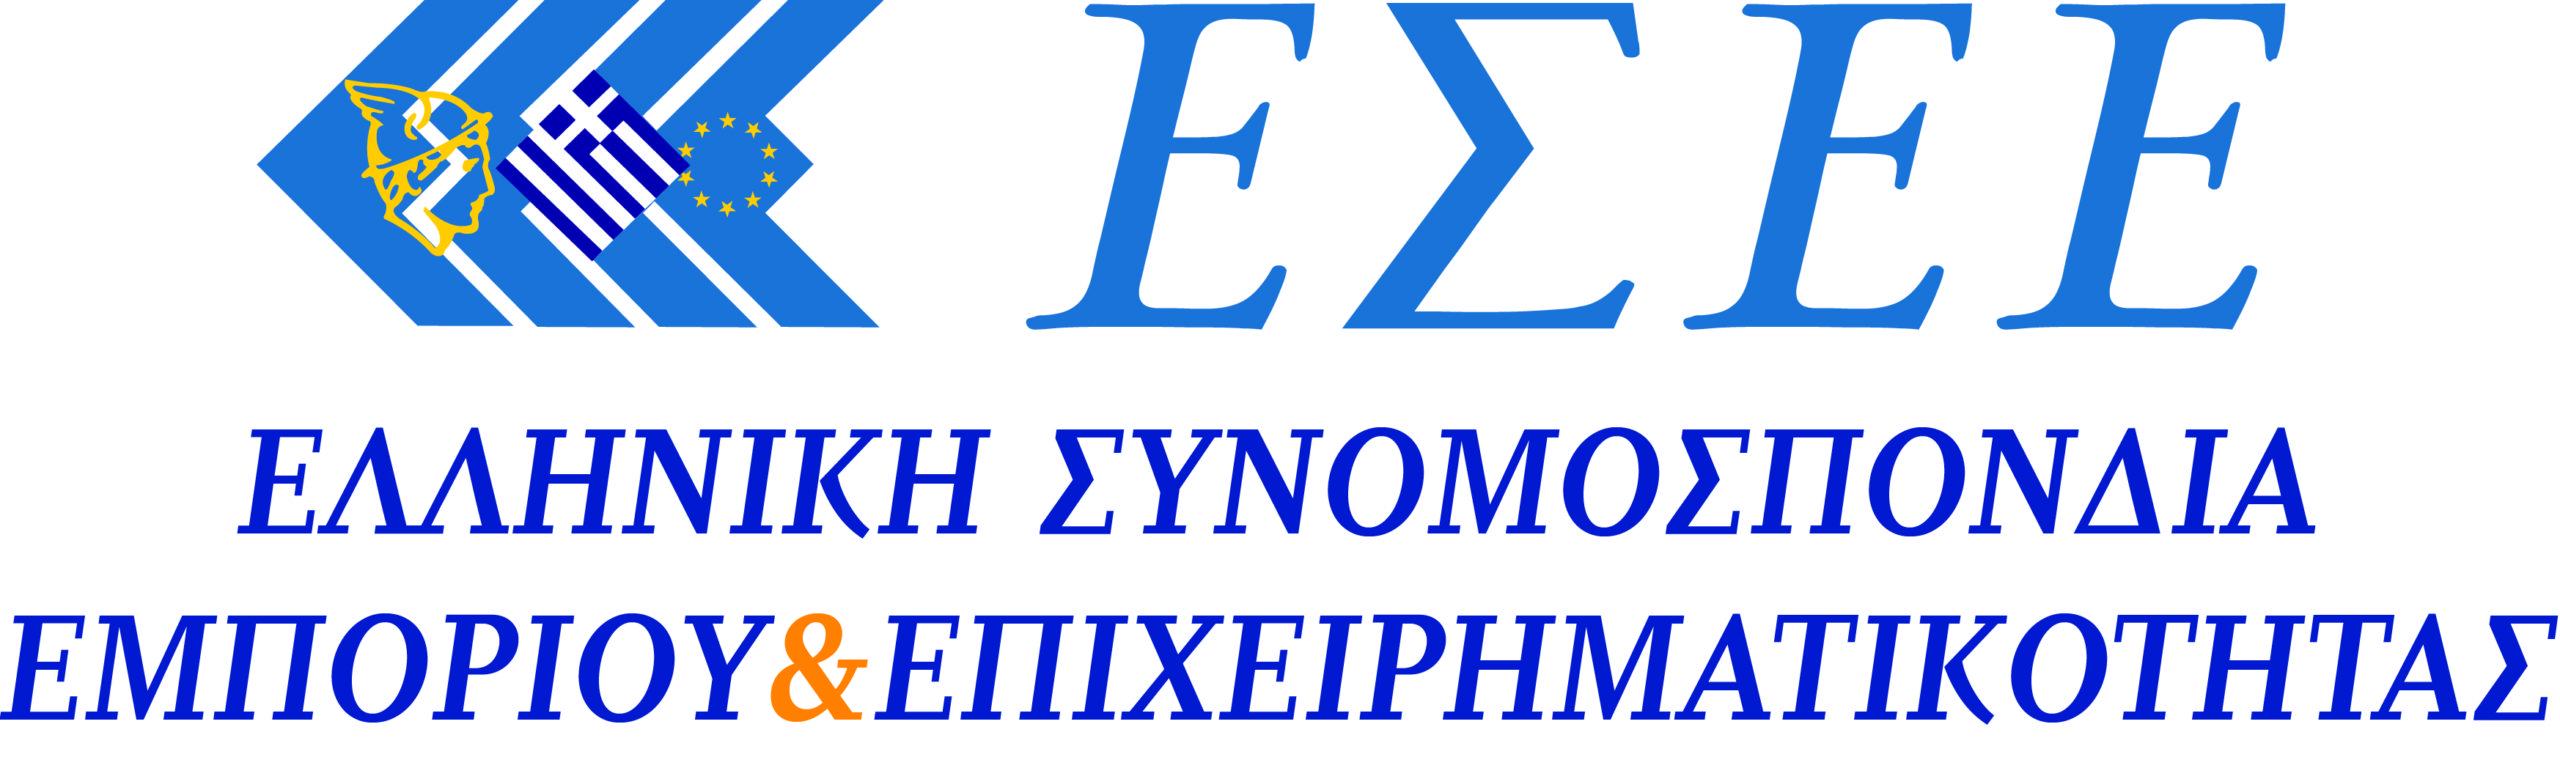 Photo of Υποχρεωτική και καθολική αναστολή λειτουργίας όλων των εμπορικών καταστημάτων ζητά η ΕΣΕΕ